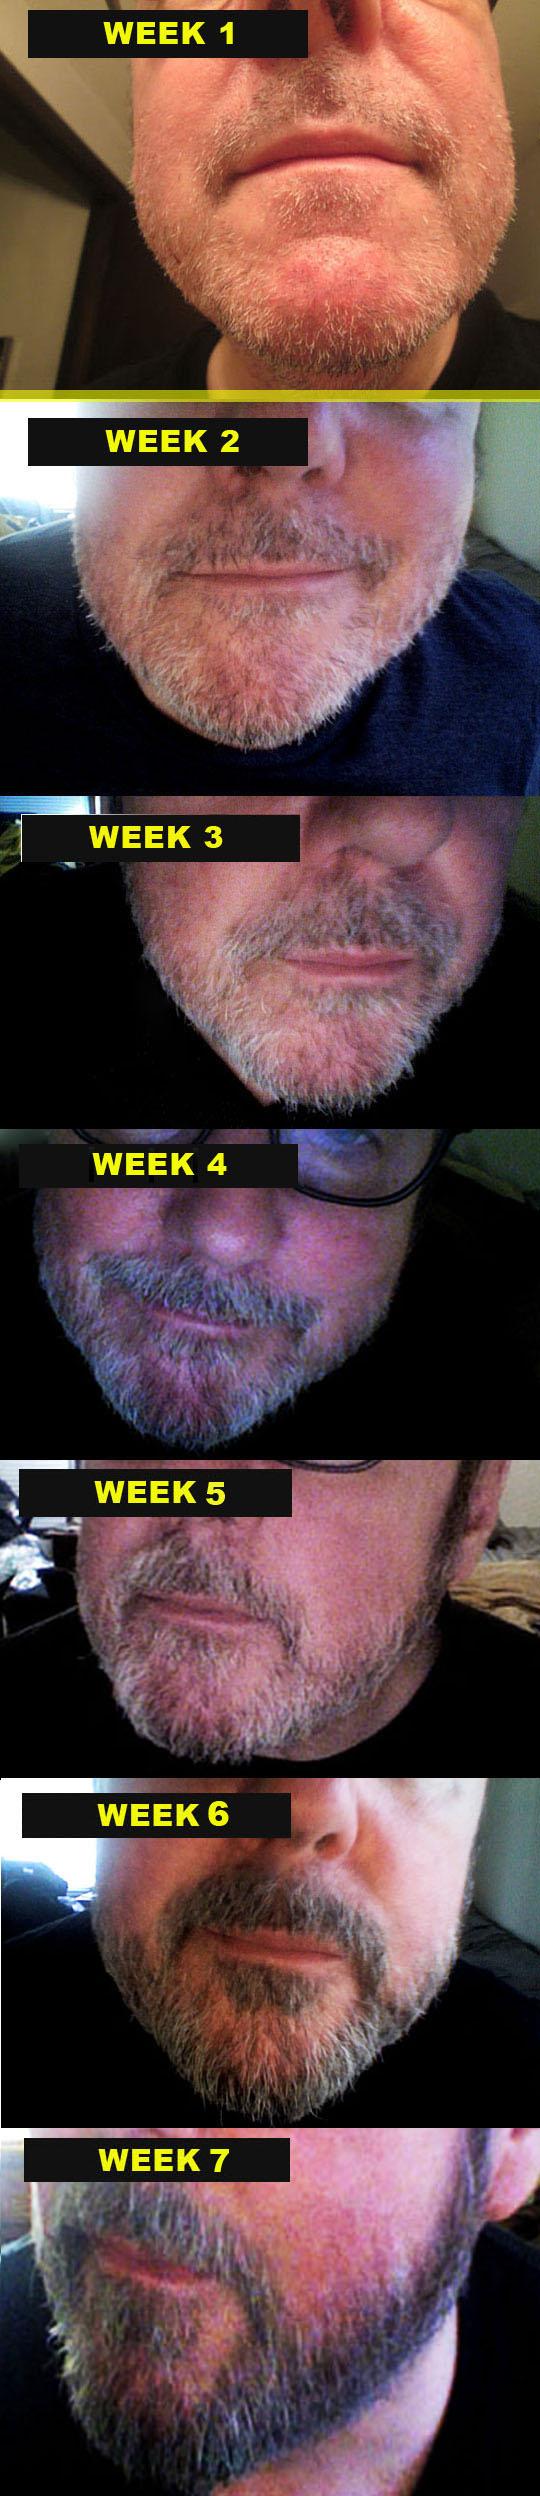 7. weeklygrowthchart_feb-9-19.jpg